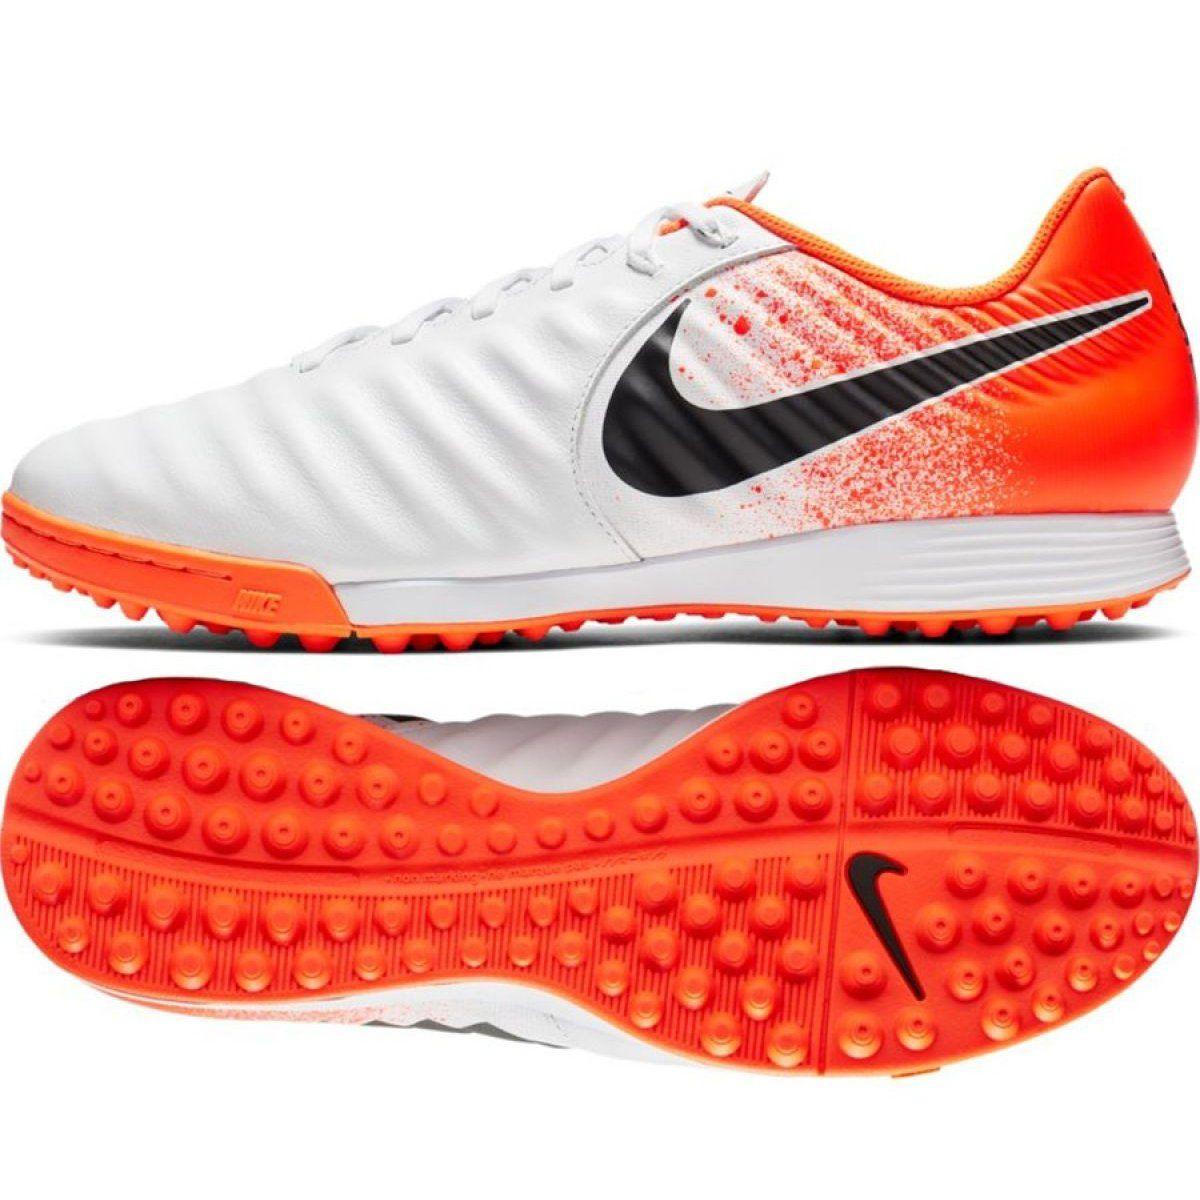 Buty Pilkarskie Nike Tiempo Legendx 7 Academy Tf M Ah7243 118 Biale Wielokolorowe Football Shoes Nike Shoes Nike